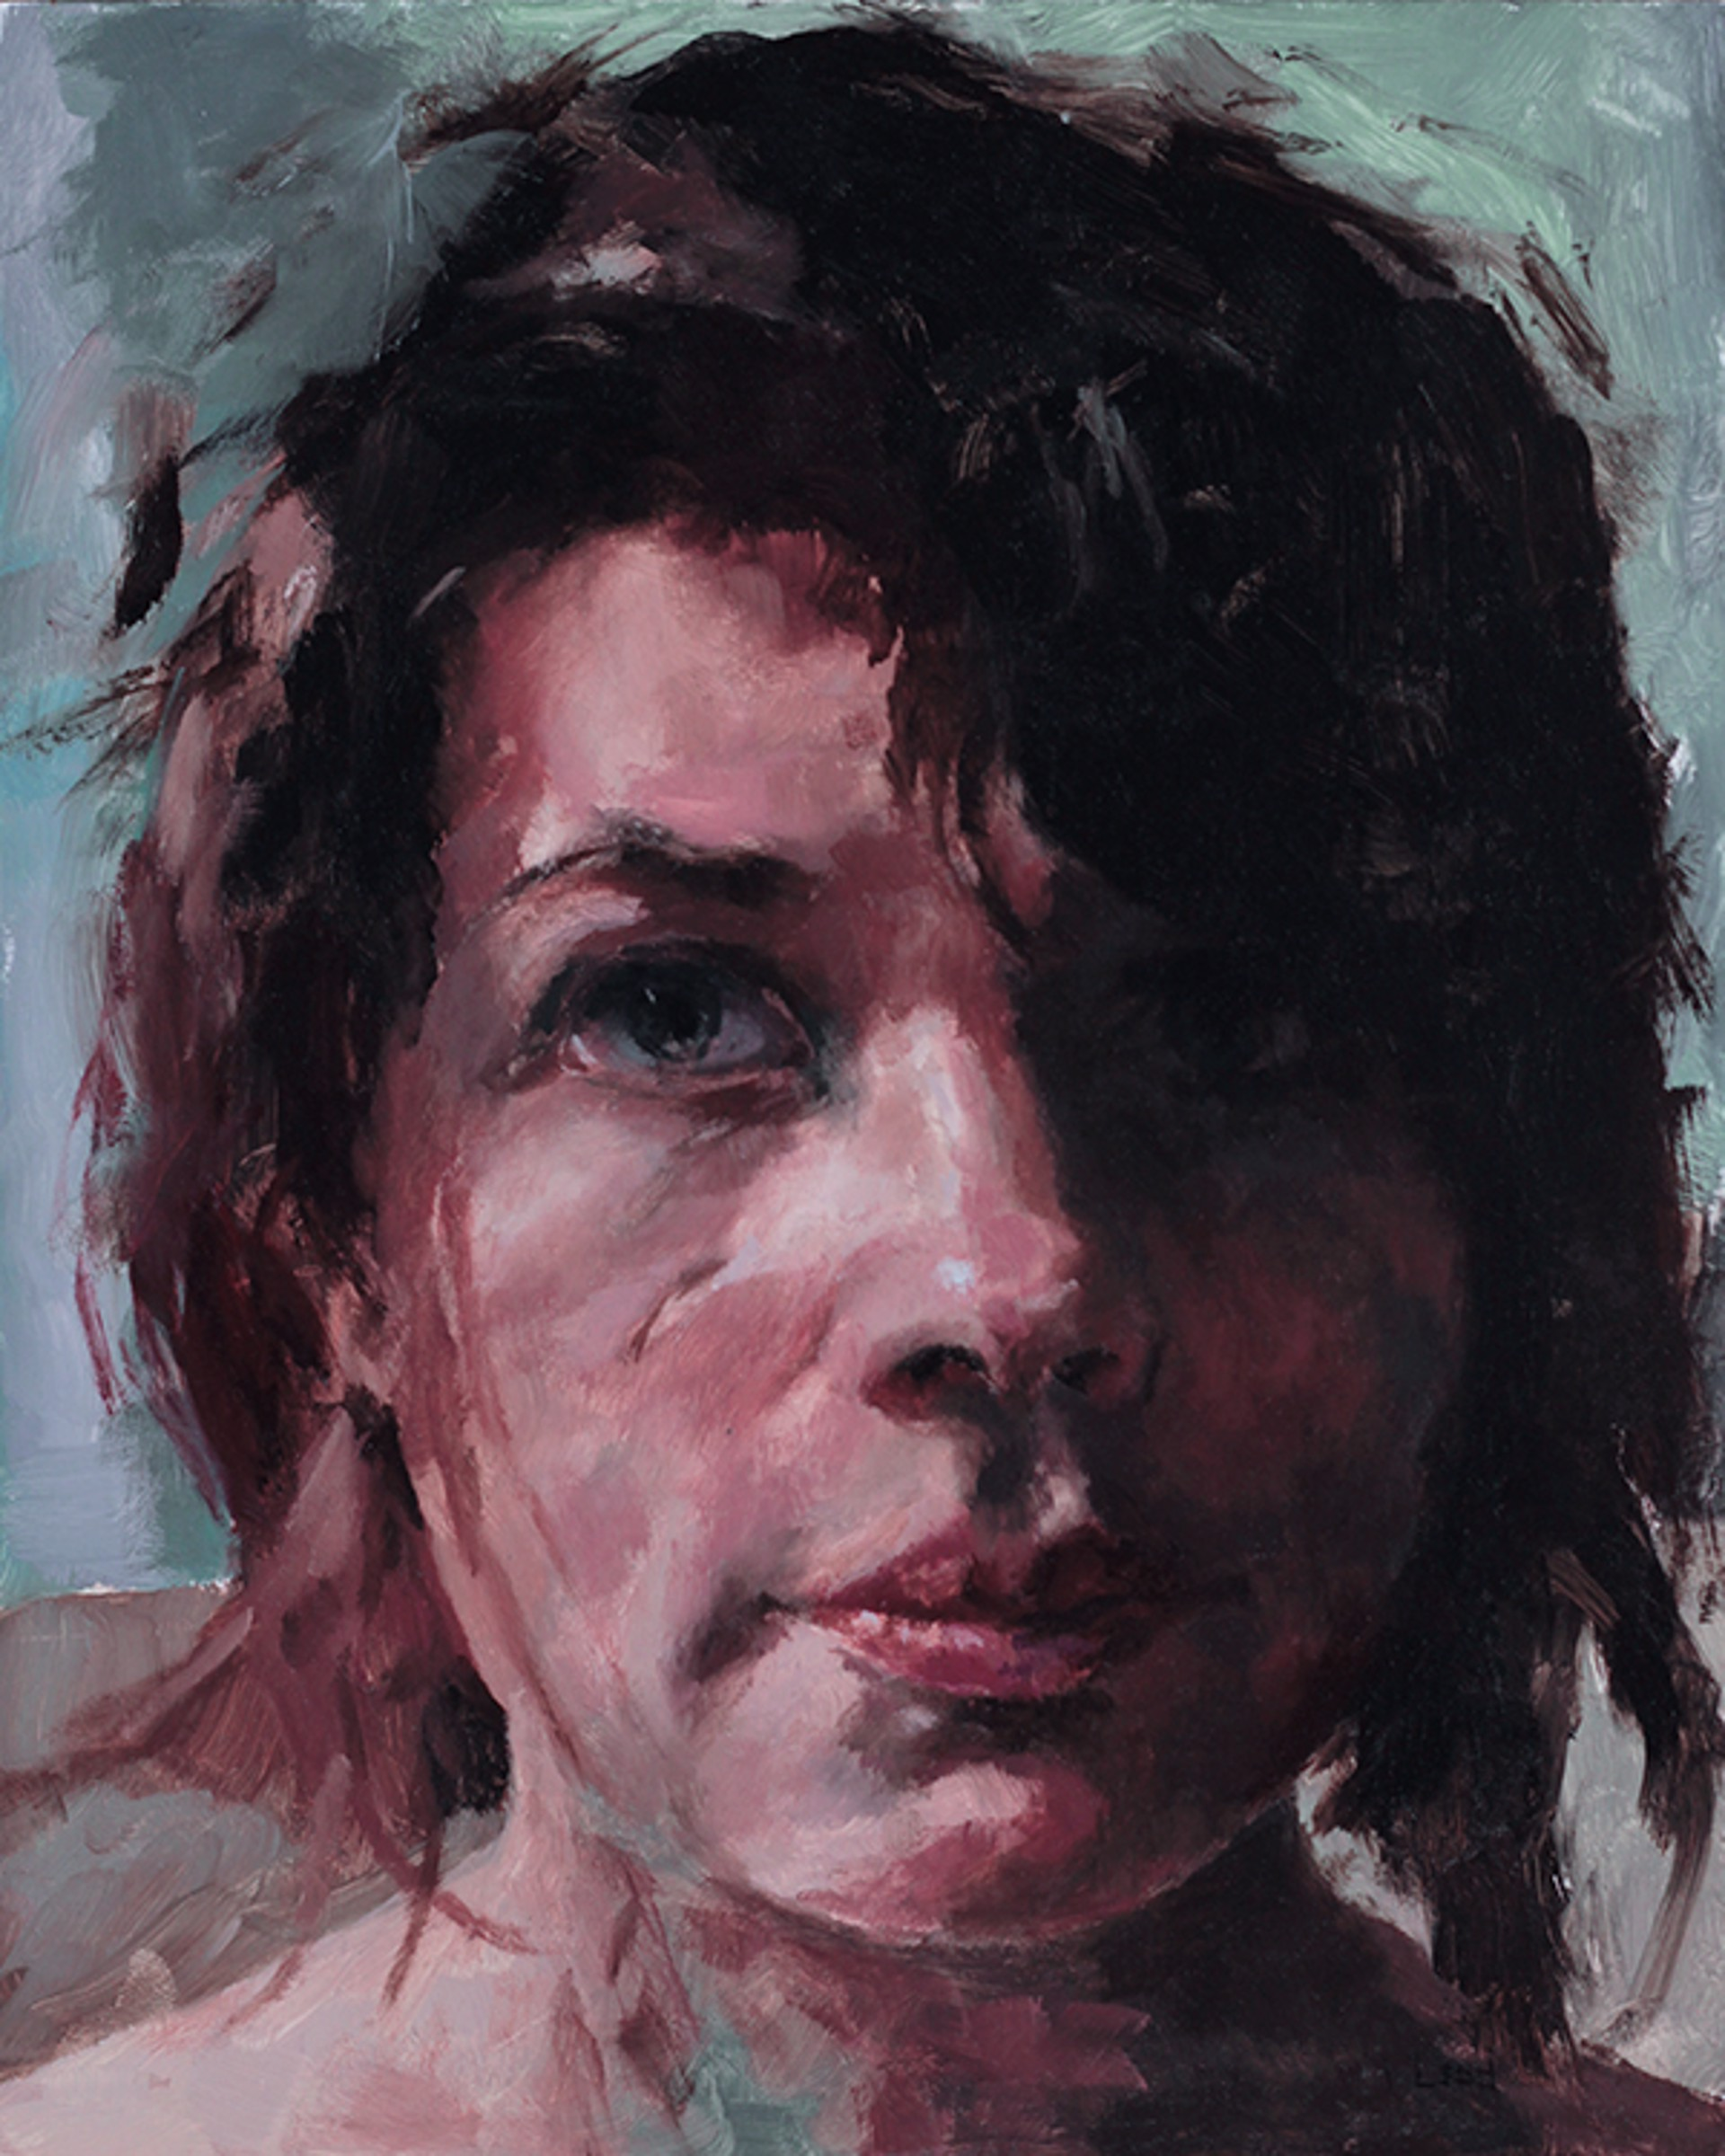 Prodrome by John McLeod